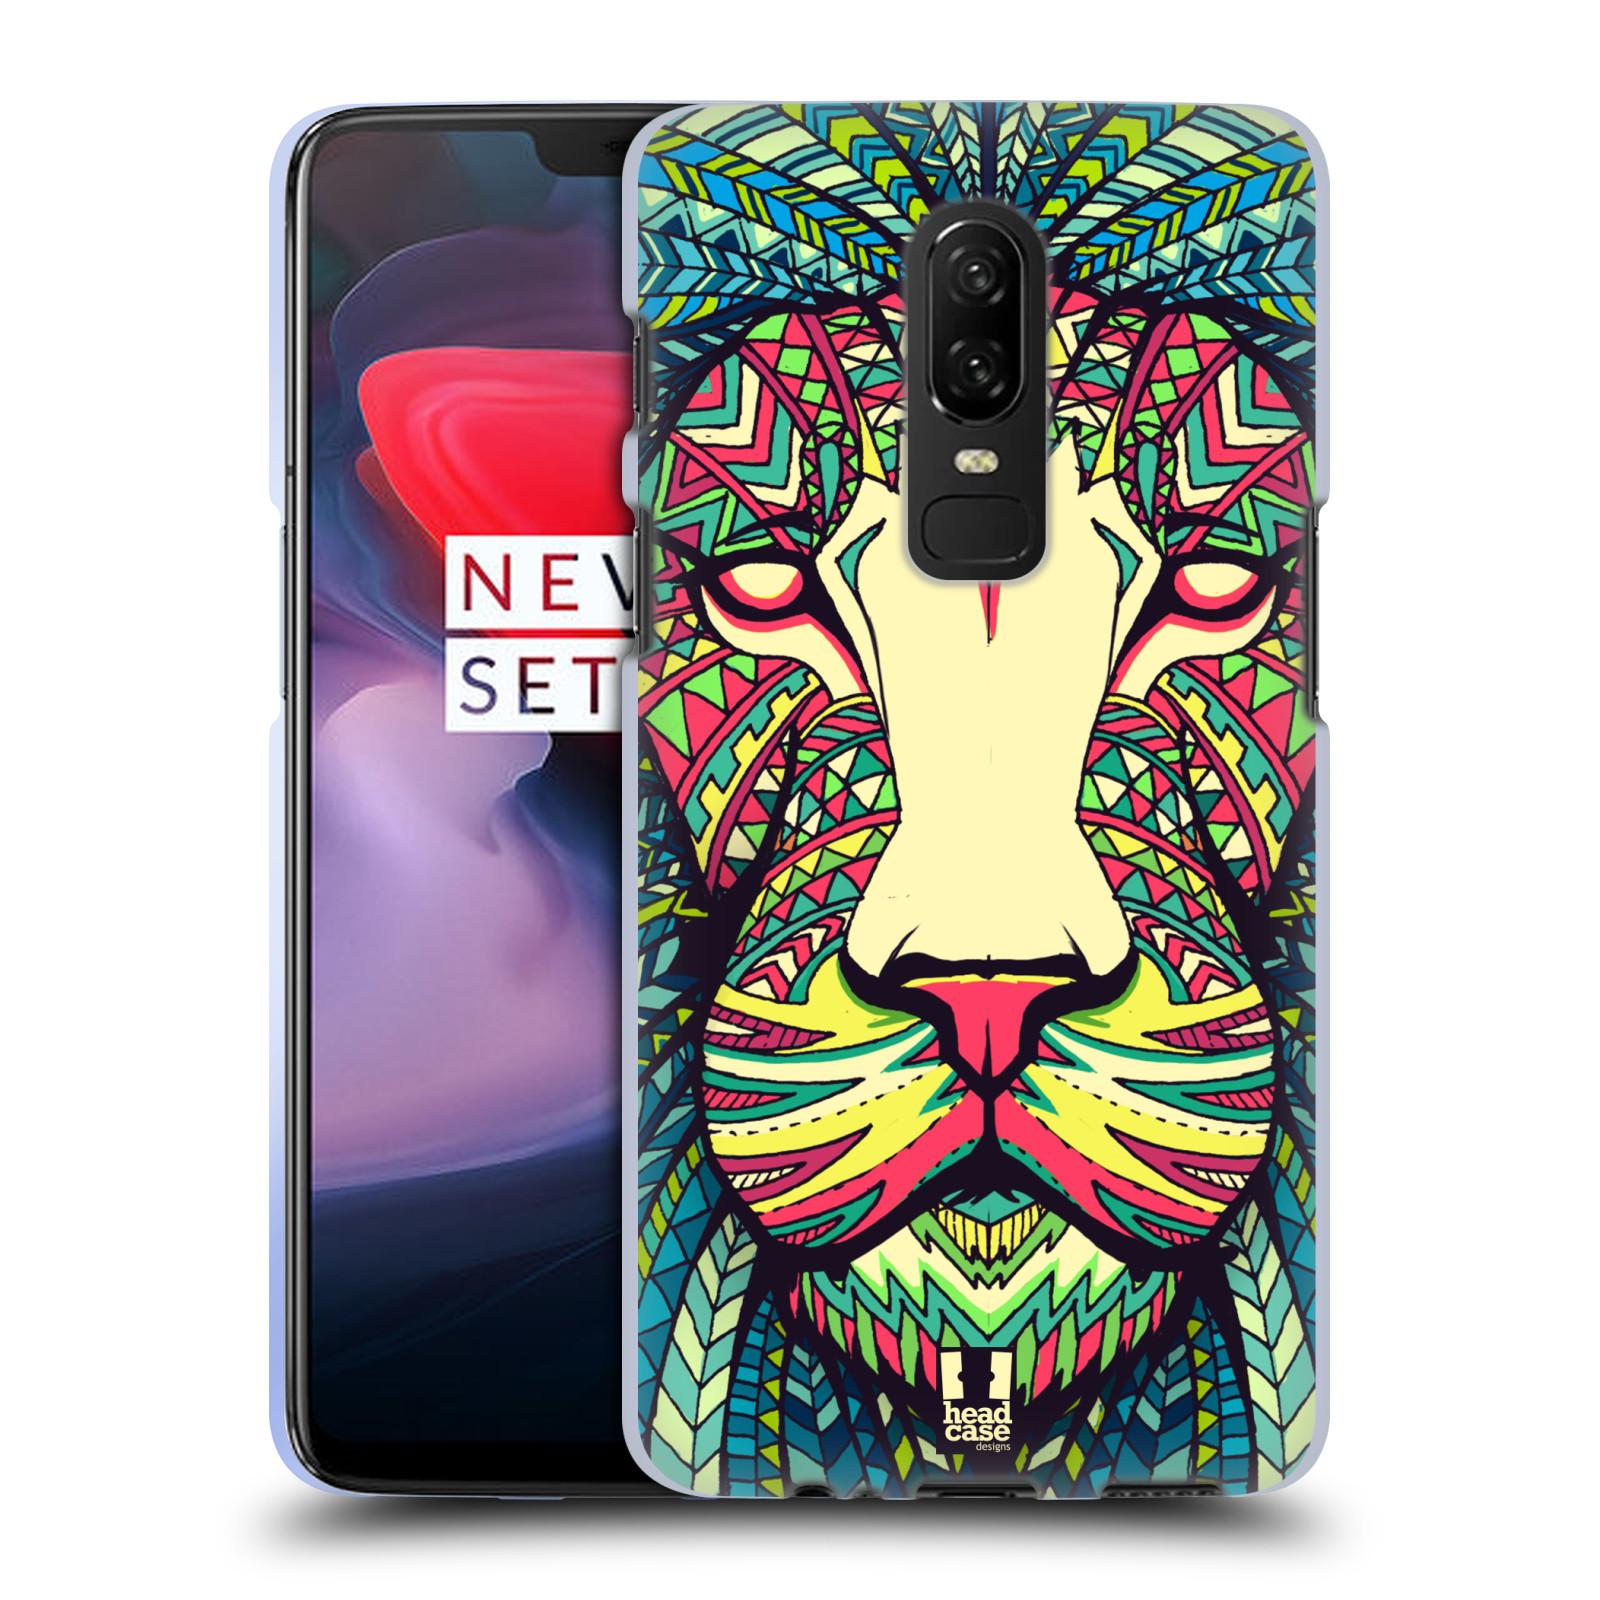 Silikonové pouzdro na mobil OnePlus 6 - Head Case - AZTEC LEV